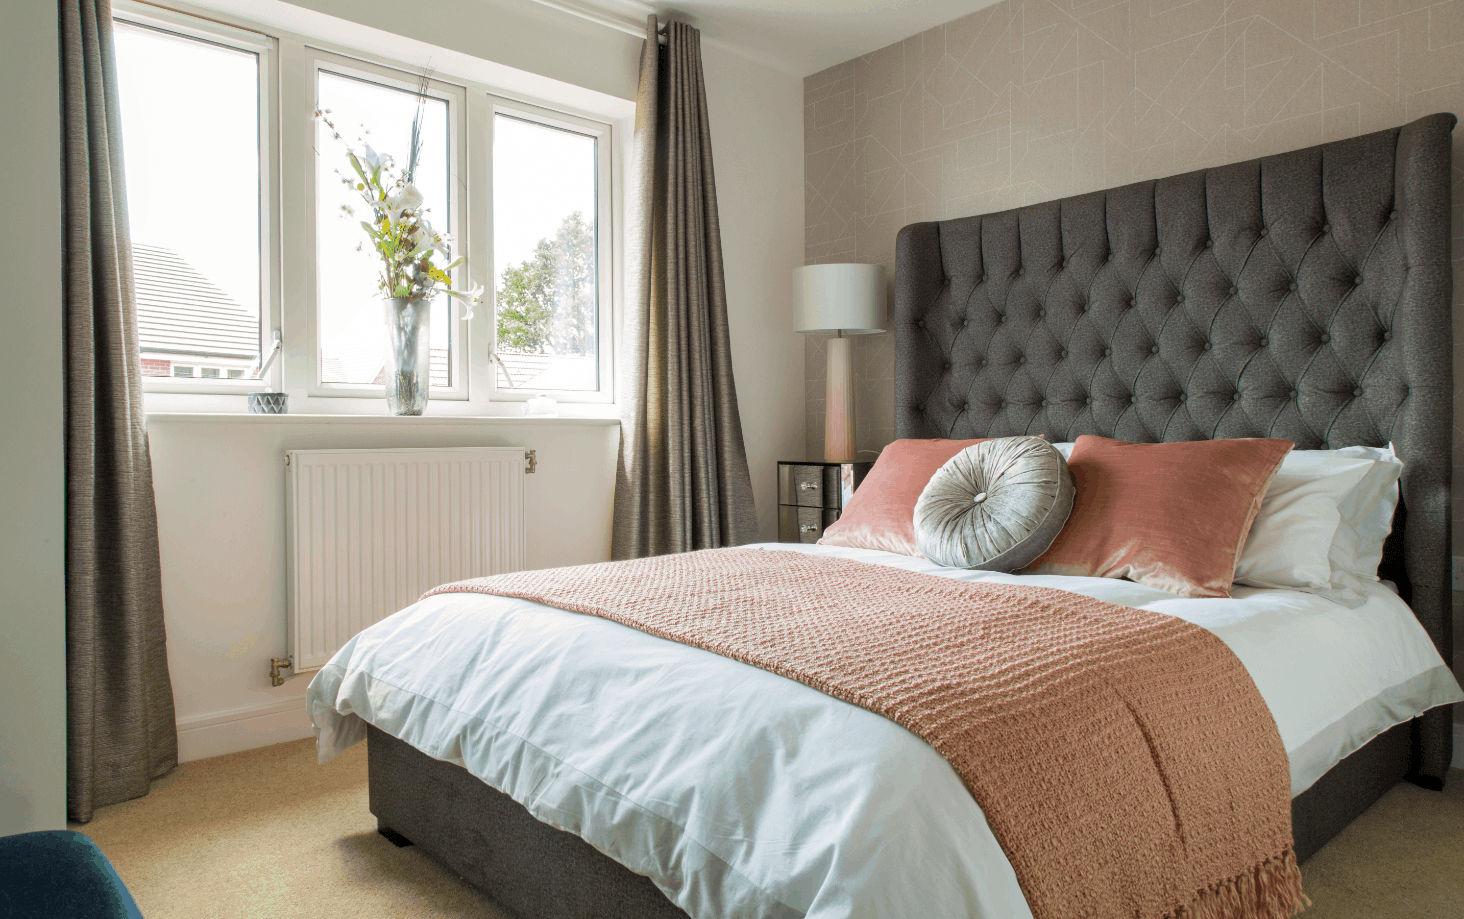 bedroom-resize-min.jpg